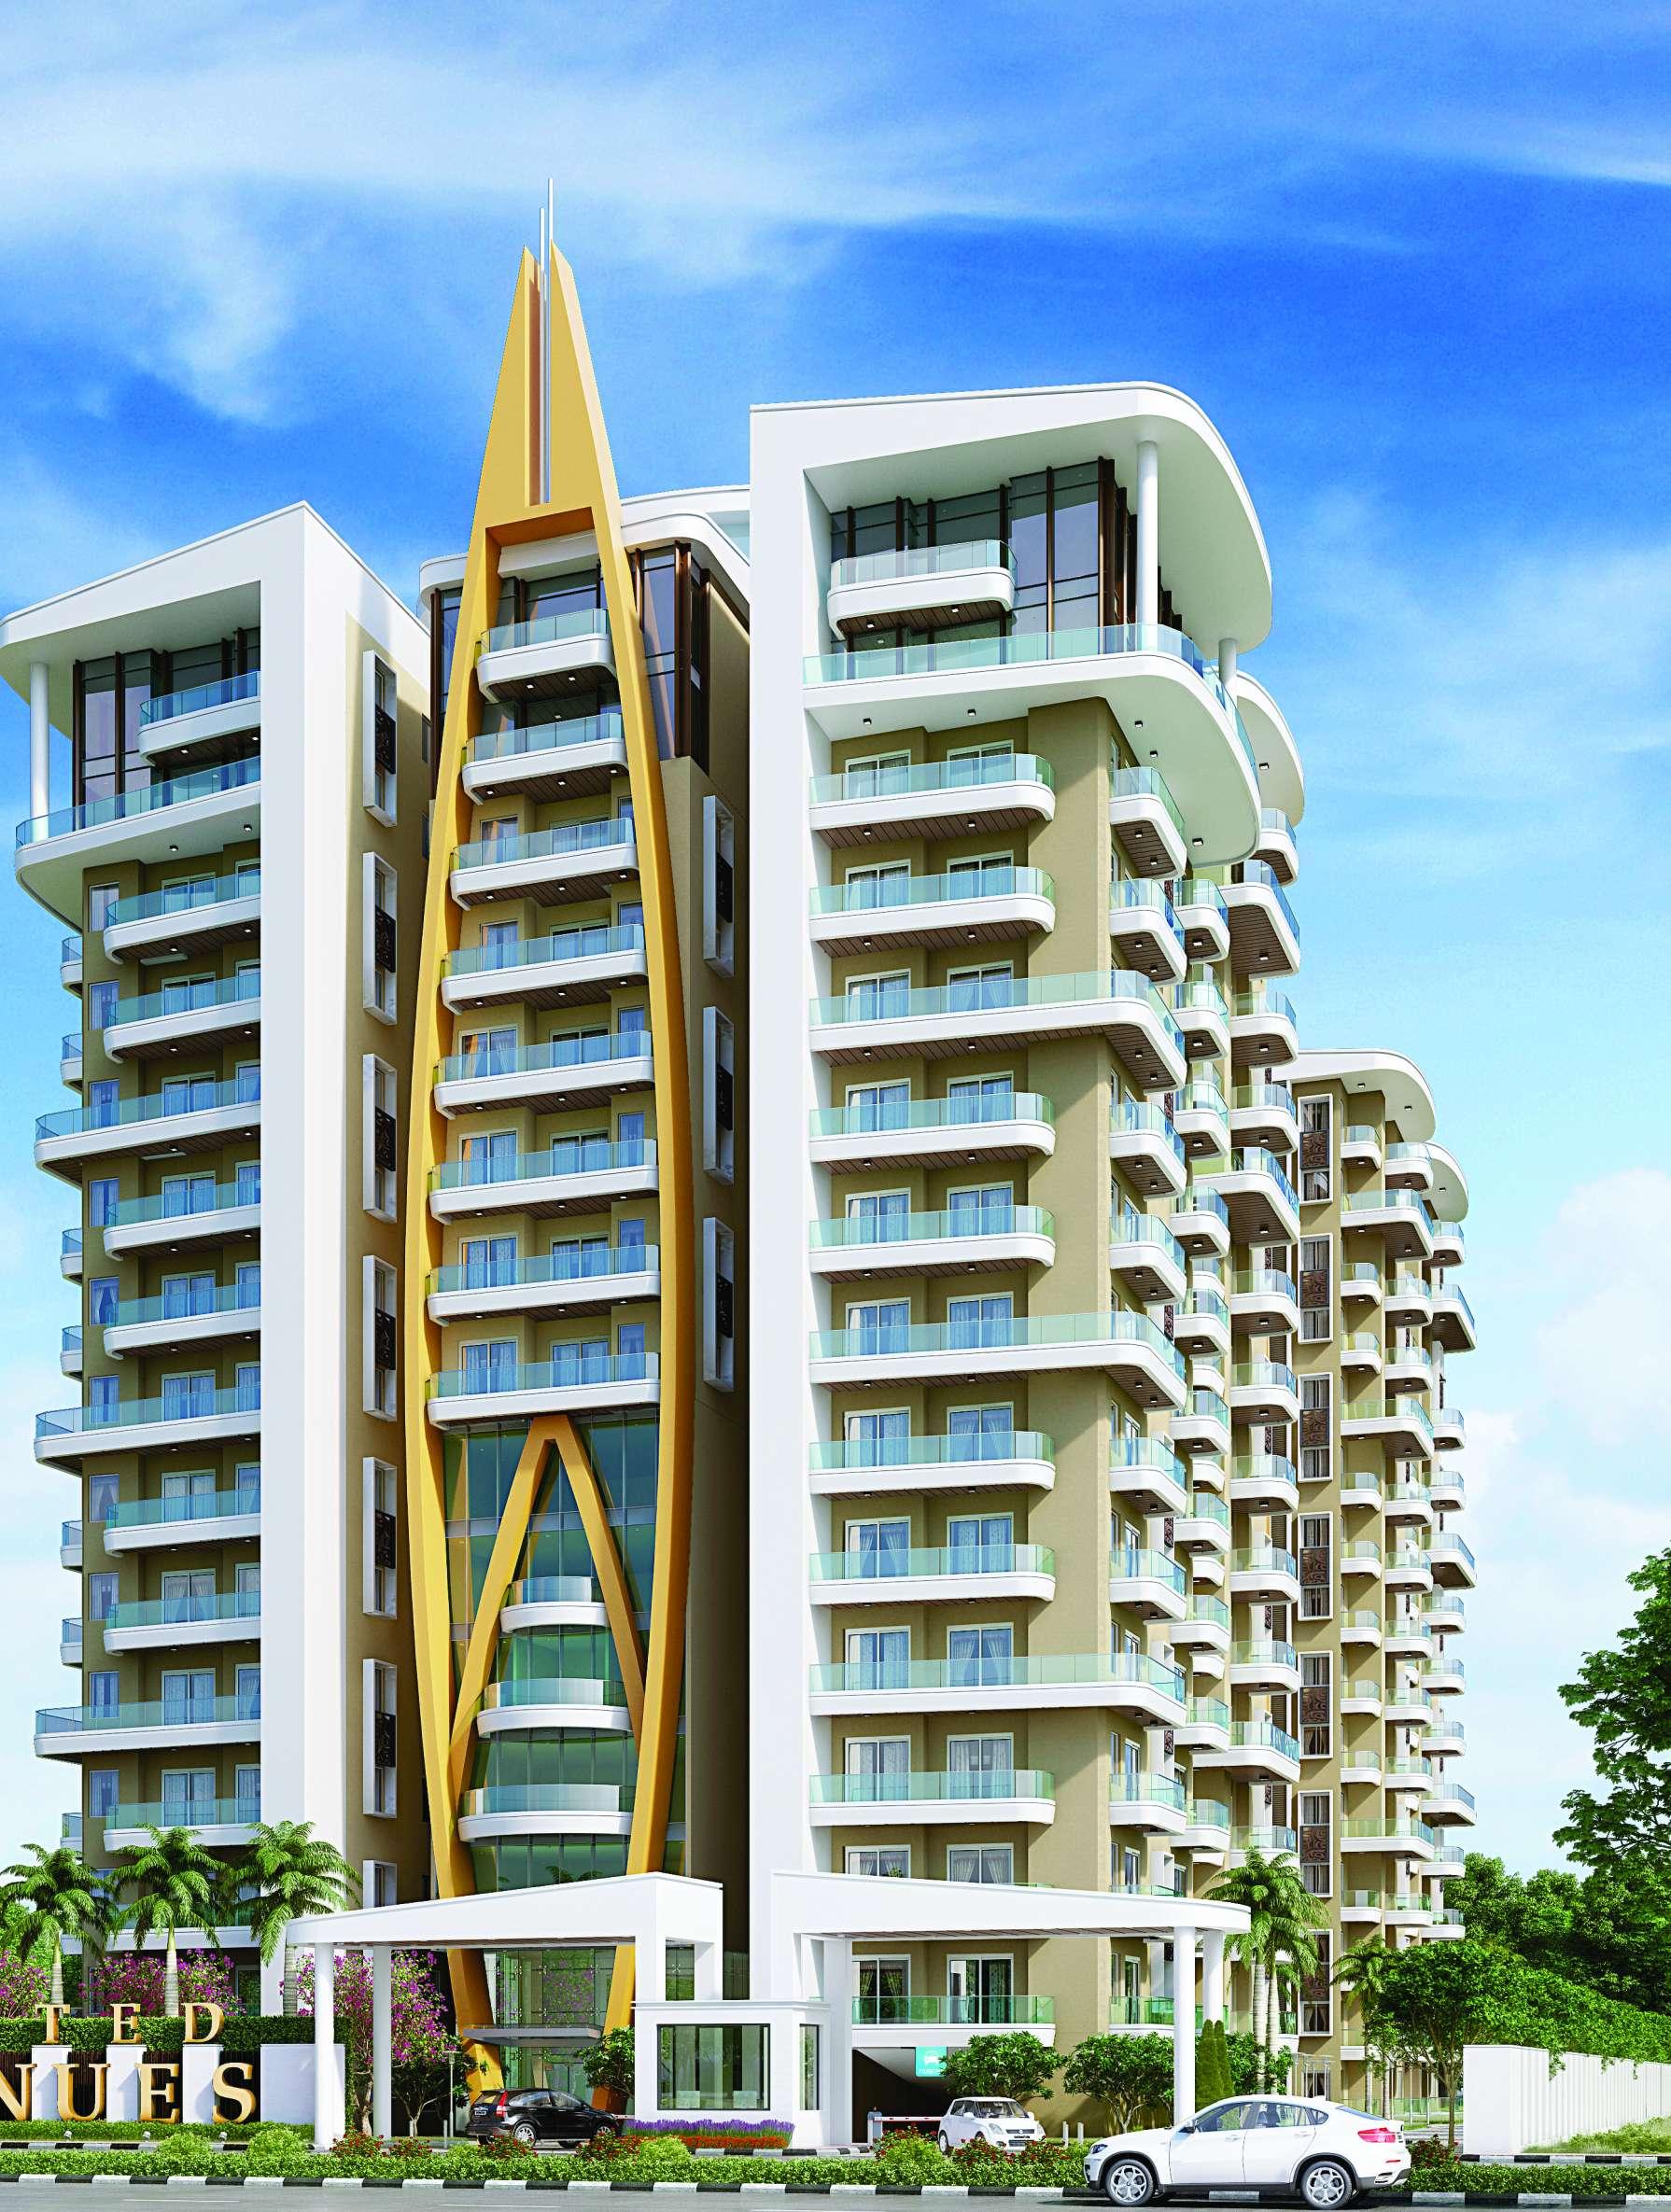 apartments for sale in amigo united avenuesnarsingi,hyderabad - real estate in narsingi